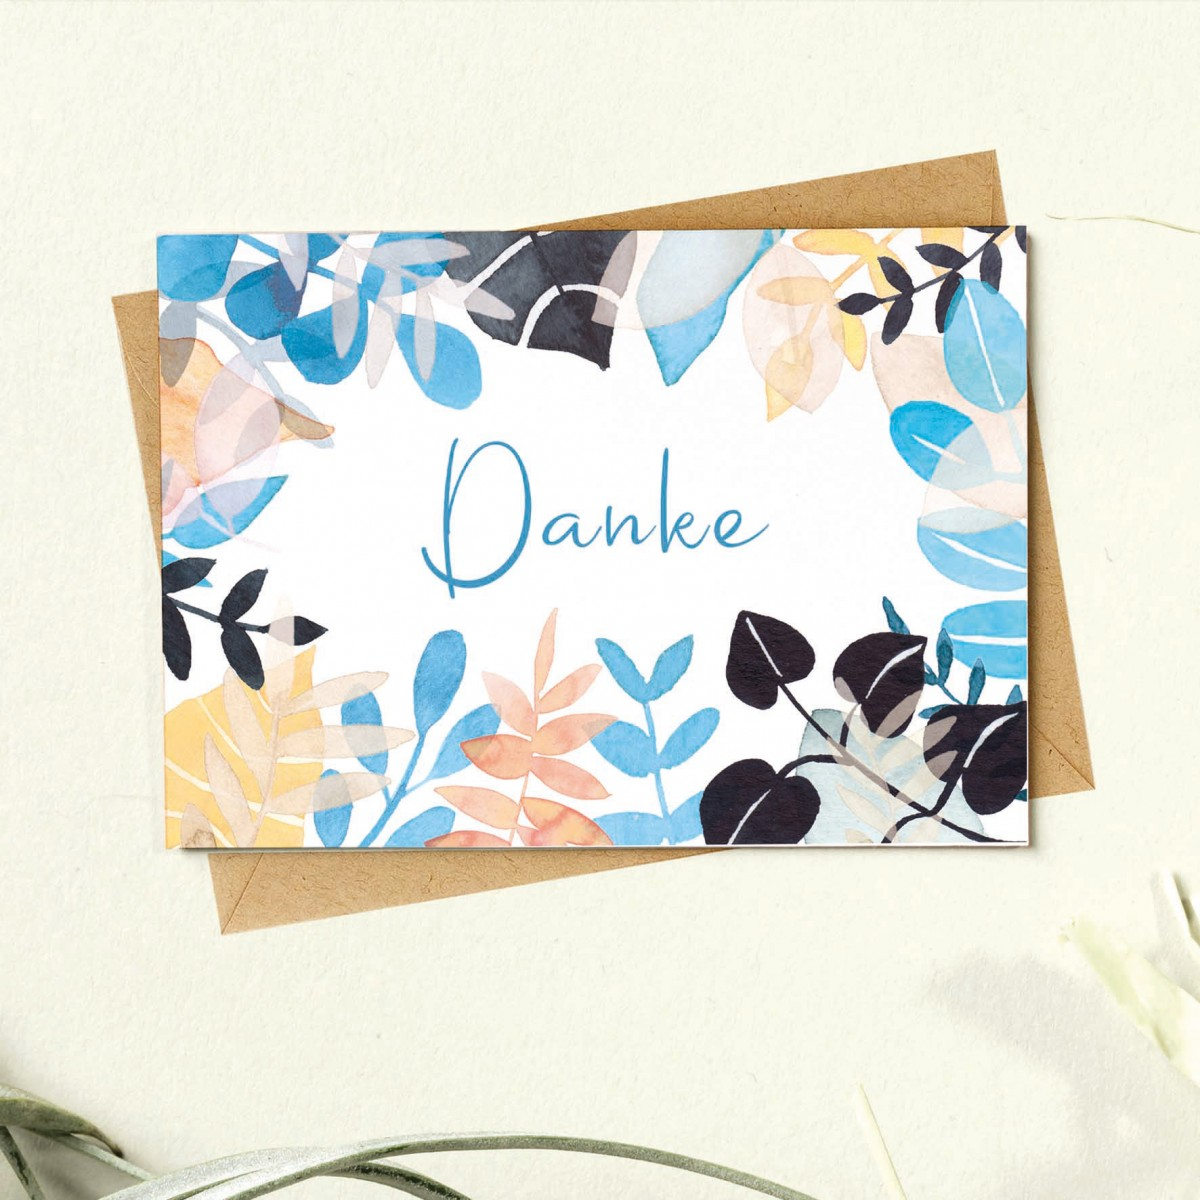 Paperlandscape | Faltkarte | Danke | Blätter | Pflanzen | bunt | verschiedene Farben